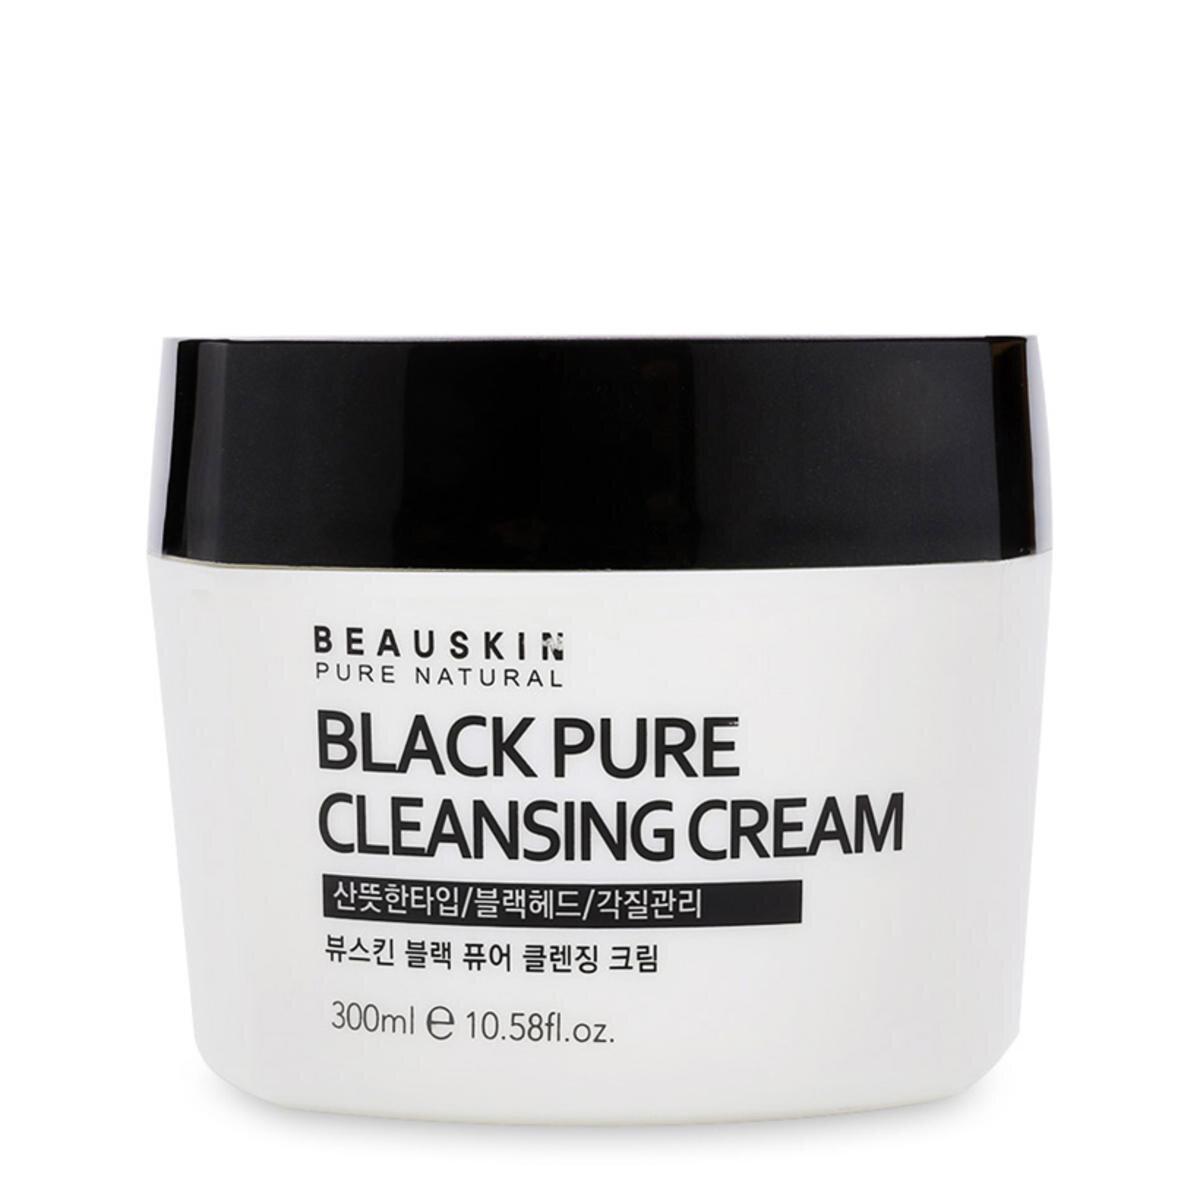 Kem tẩy trang Beauskin Black Pure Cleansing Cream 300ml